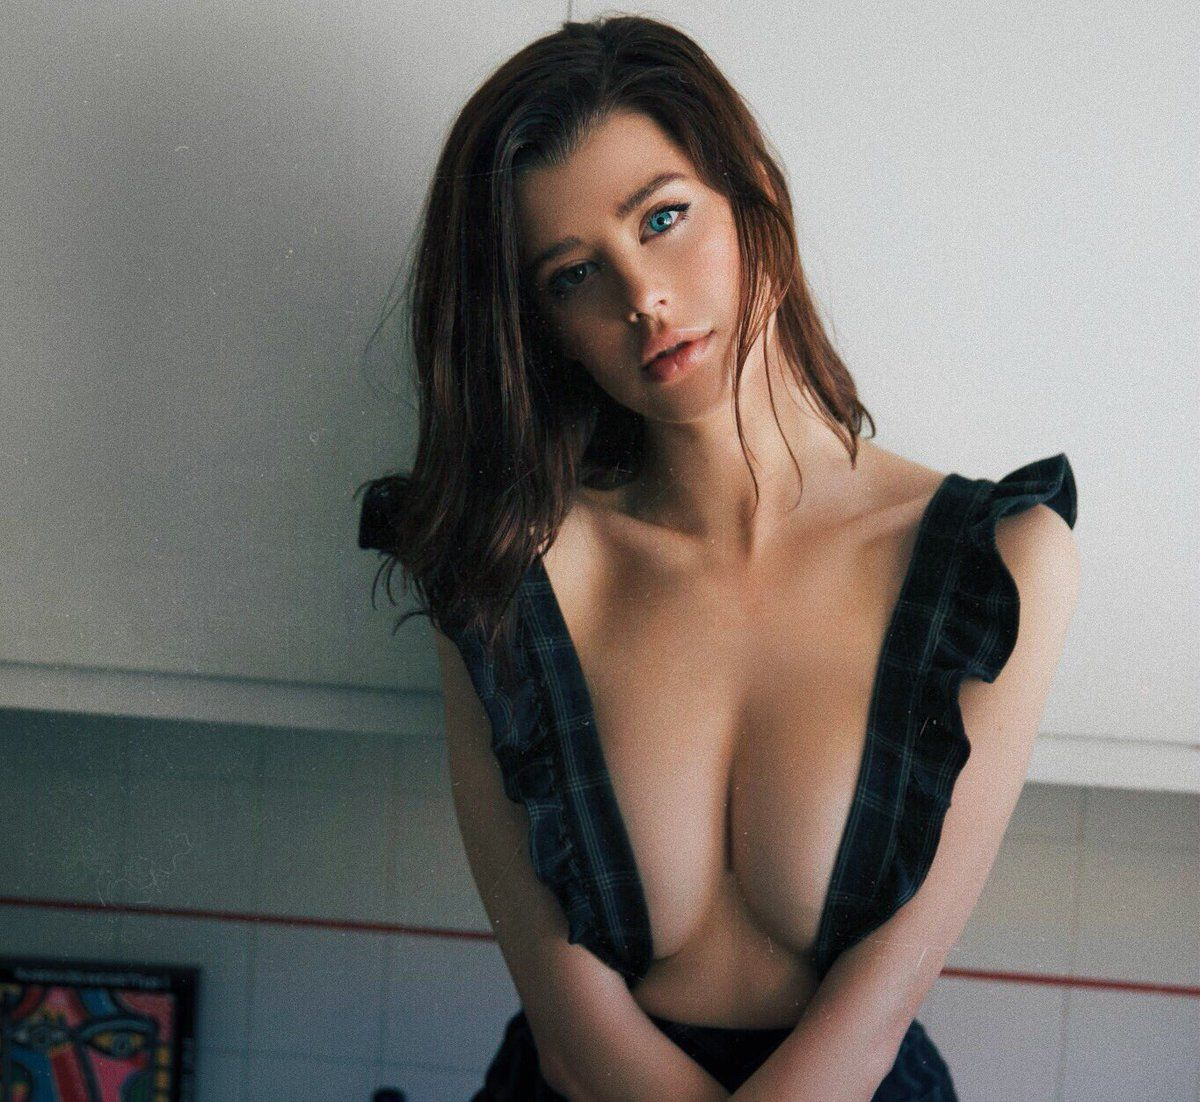 Celebrity Sarah Mcdaniel nudes (77 photos), Topless, Leaked, Boobs, braless 2020